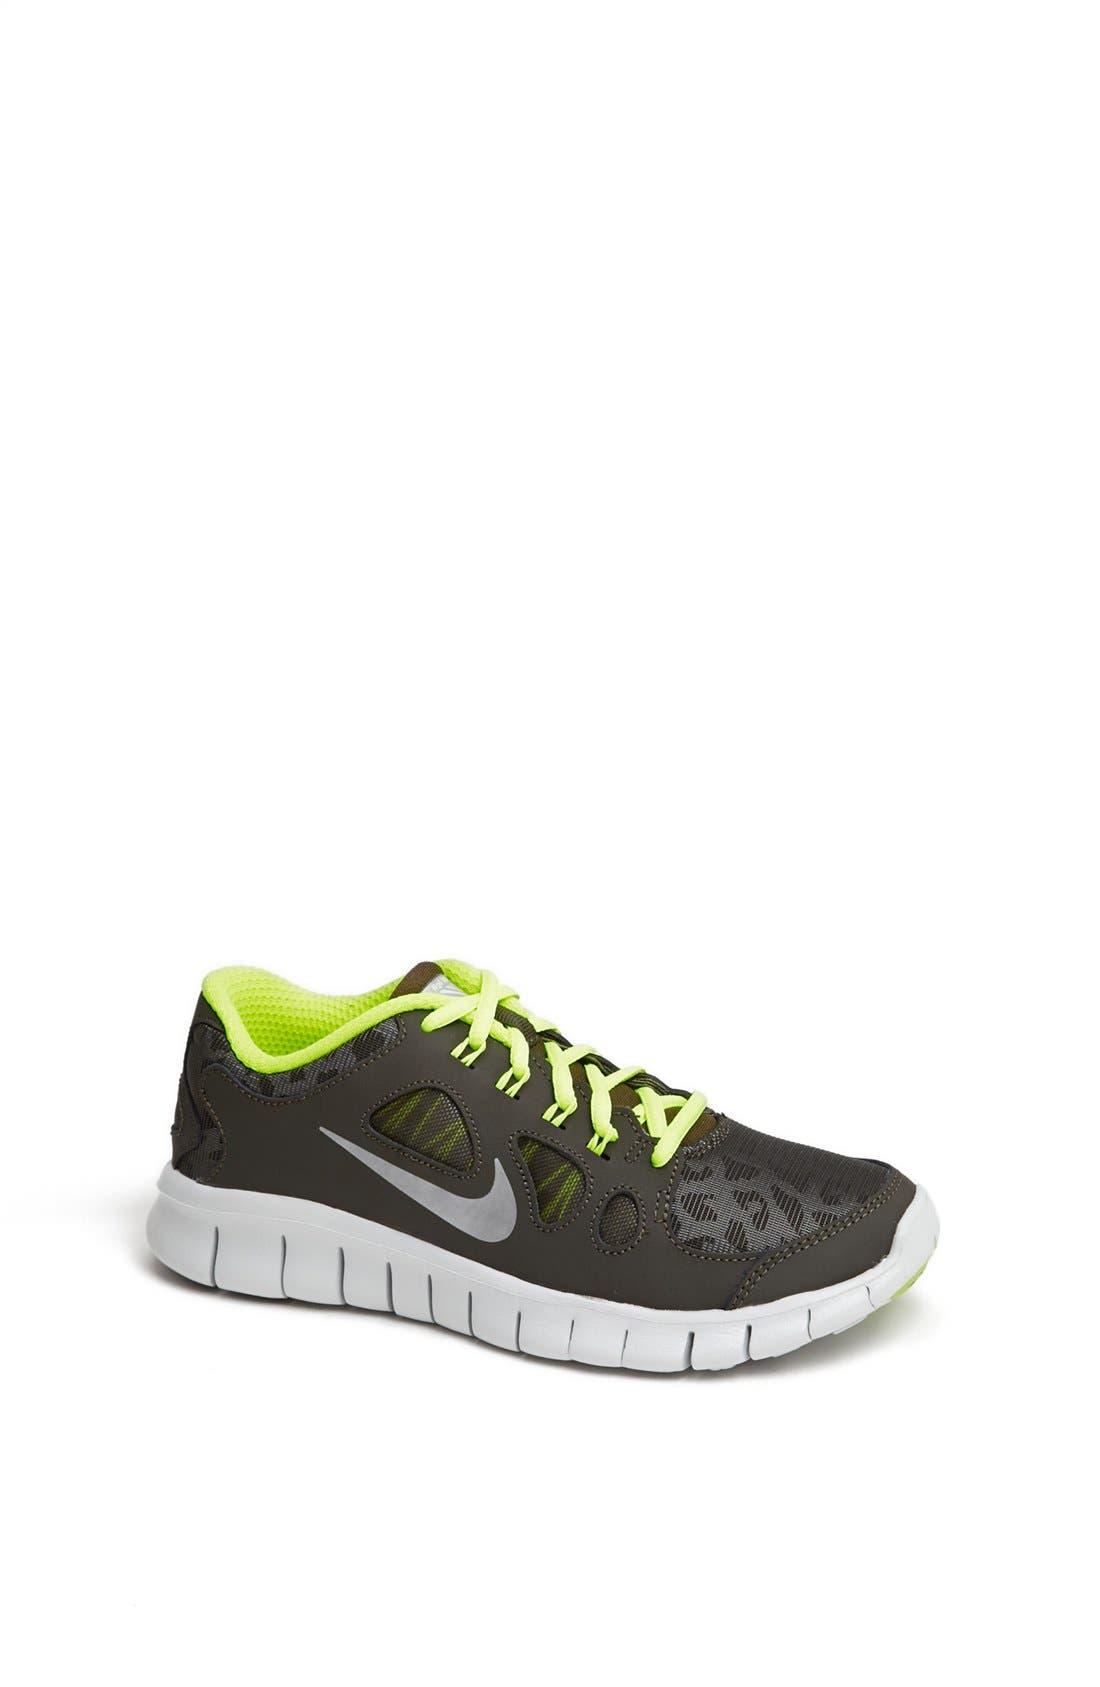 Main Image - Nike 'Free 5.0 Shield' Running Shoe (Big Kid)